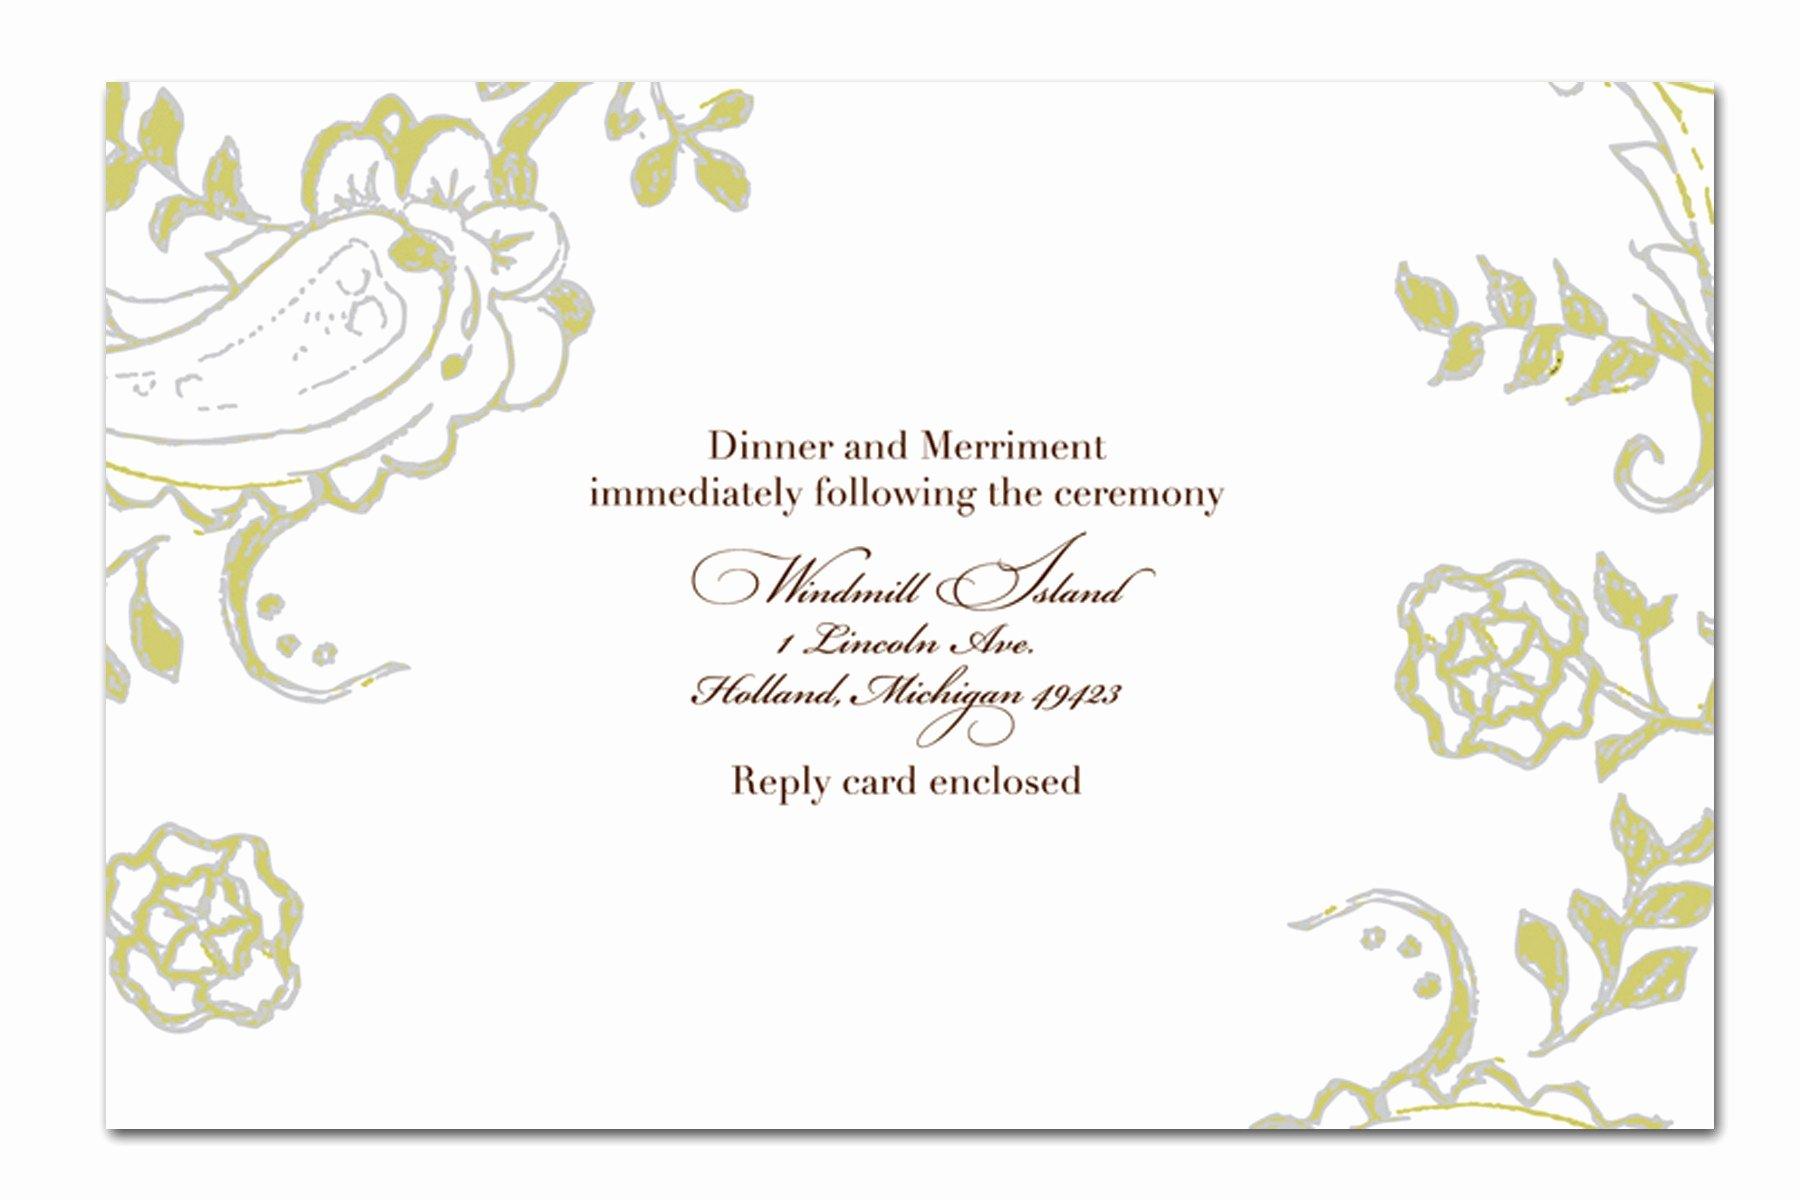 Wedding Invitation Template Psd Inspirational Wedding Invitation Templates Psd Shop Free Creative